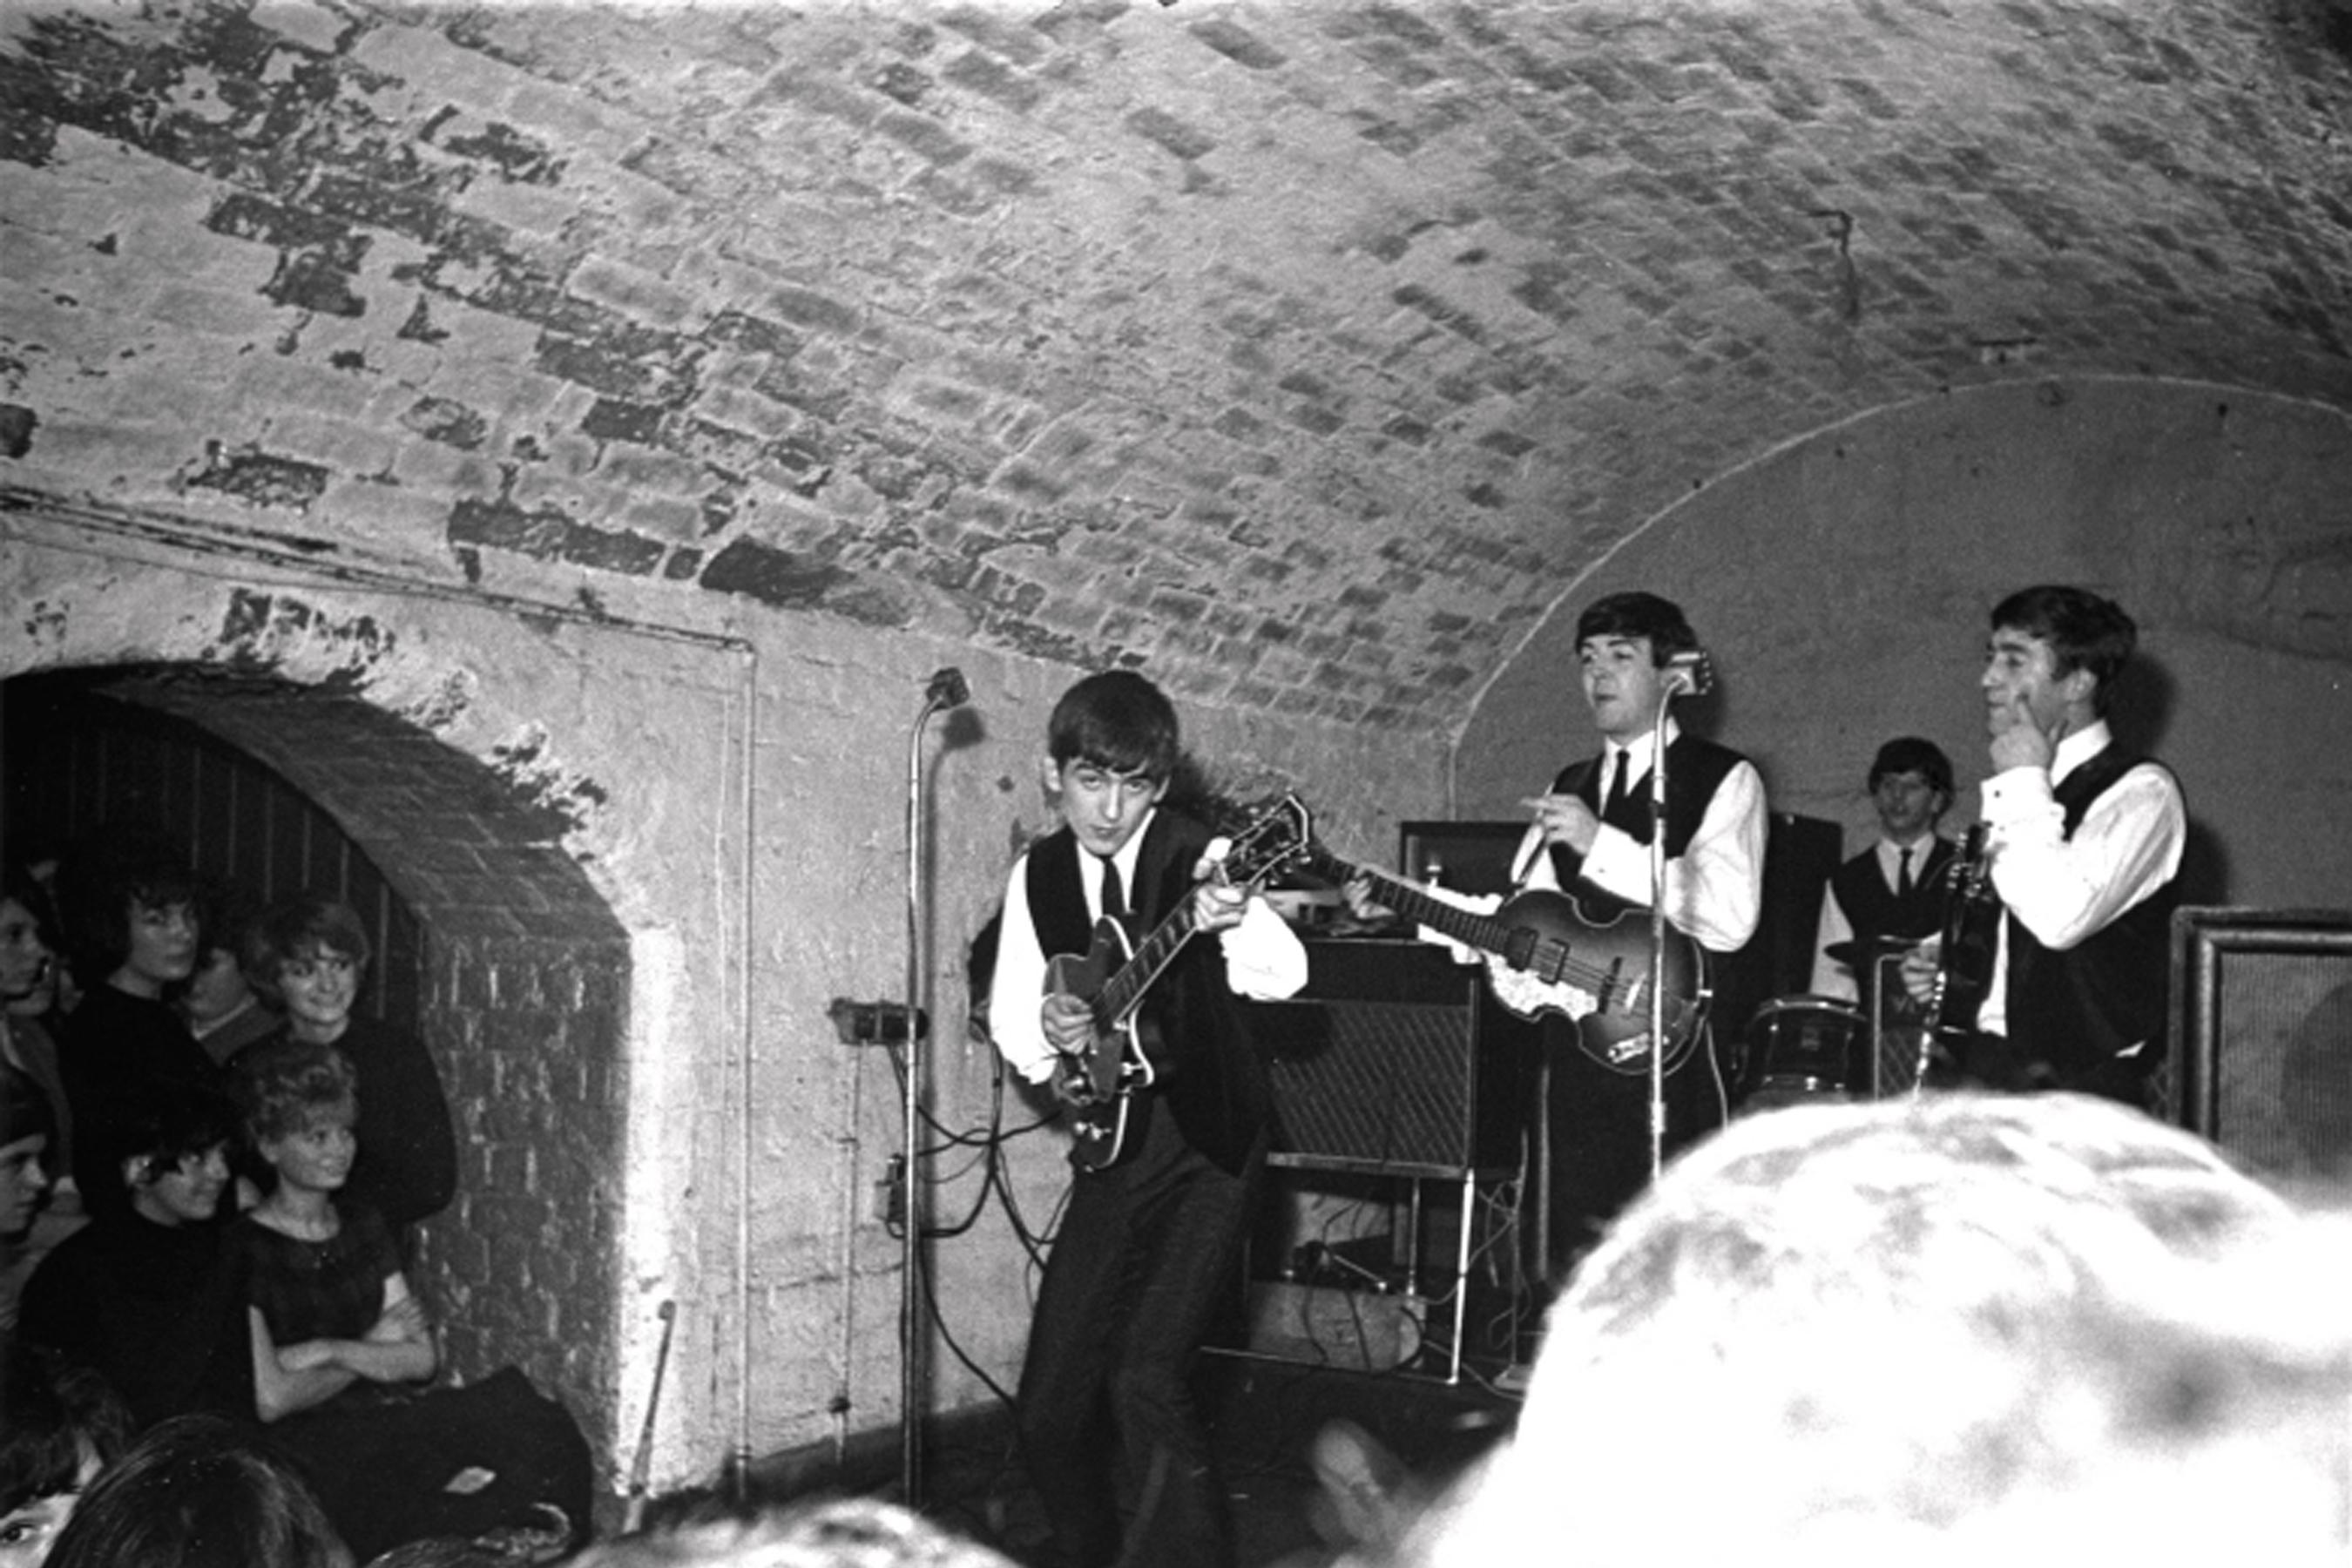 Beatles-cavern-club-photo-9.00x6.00.jpg